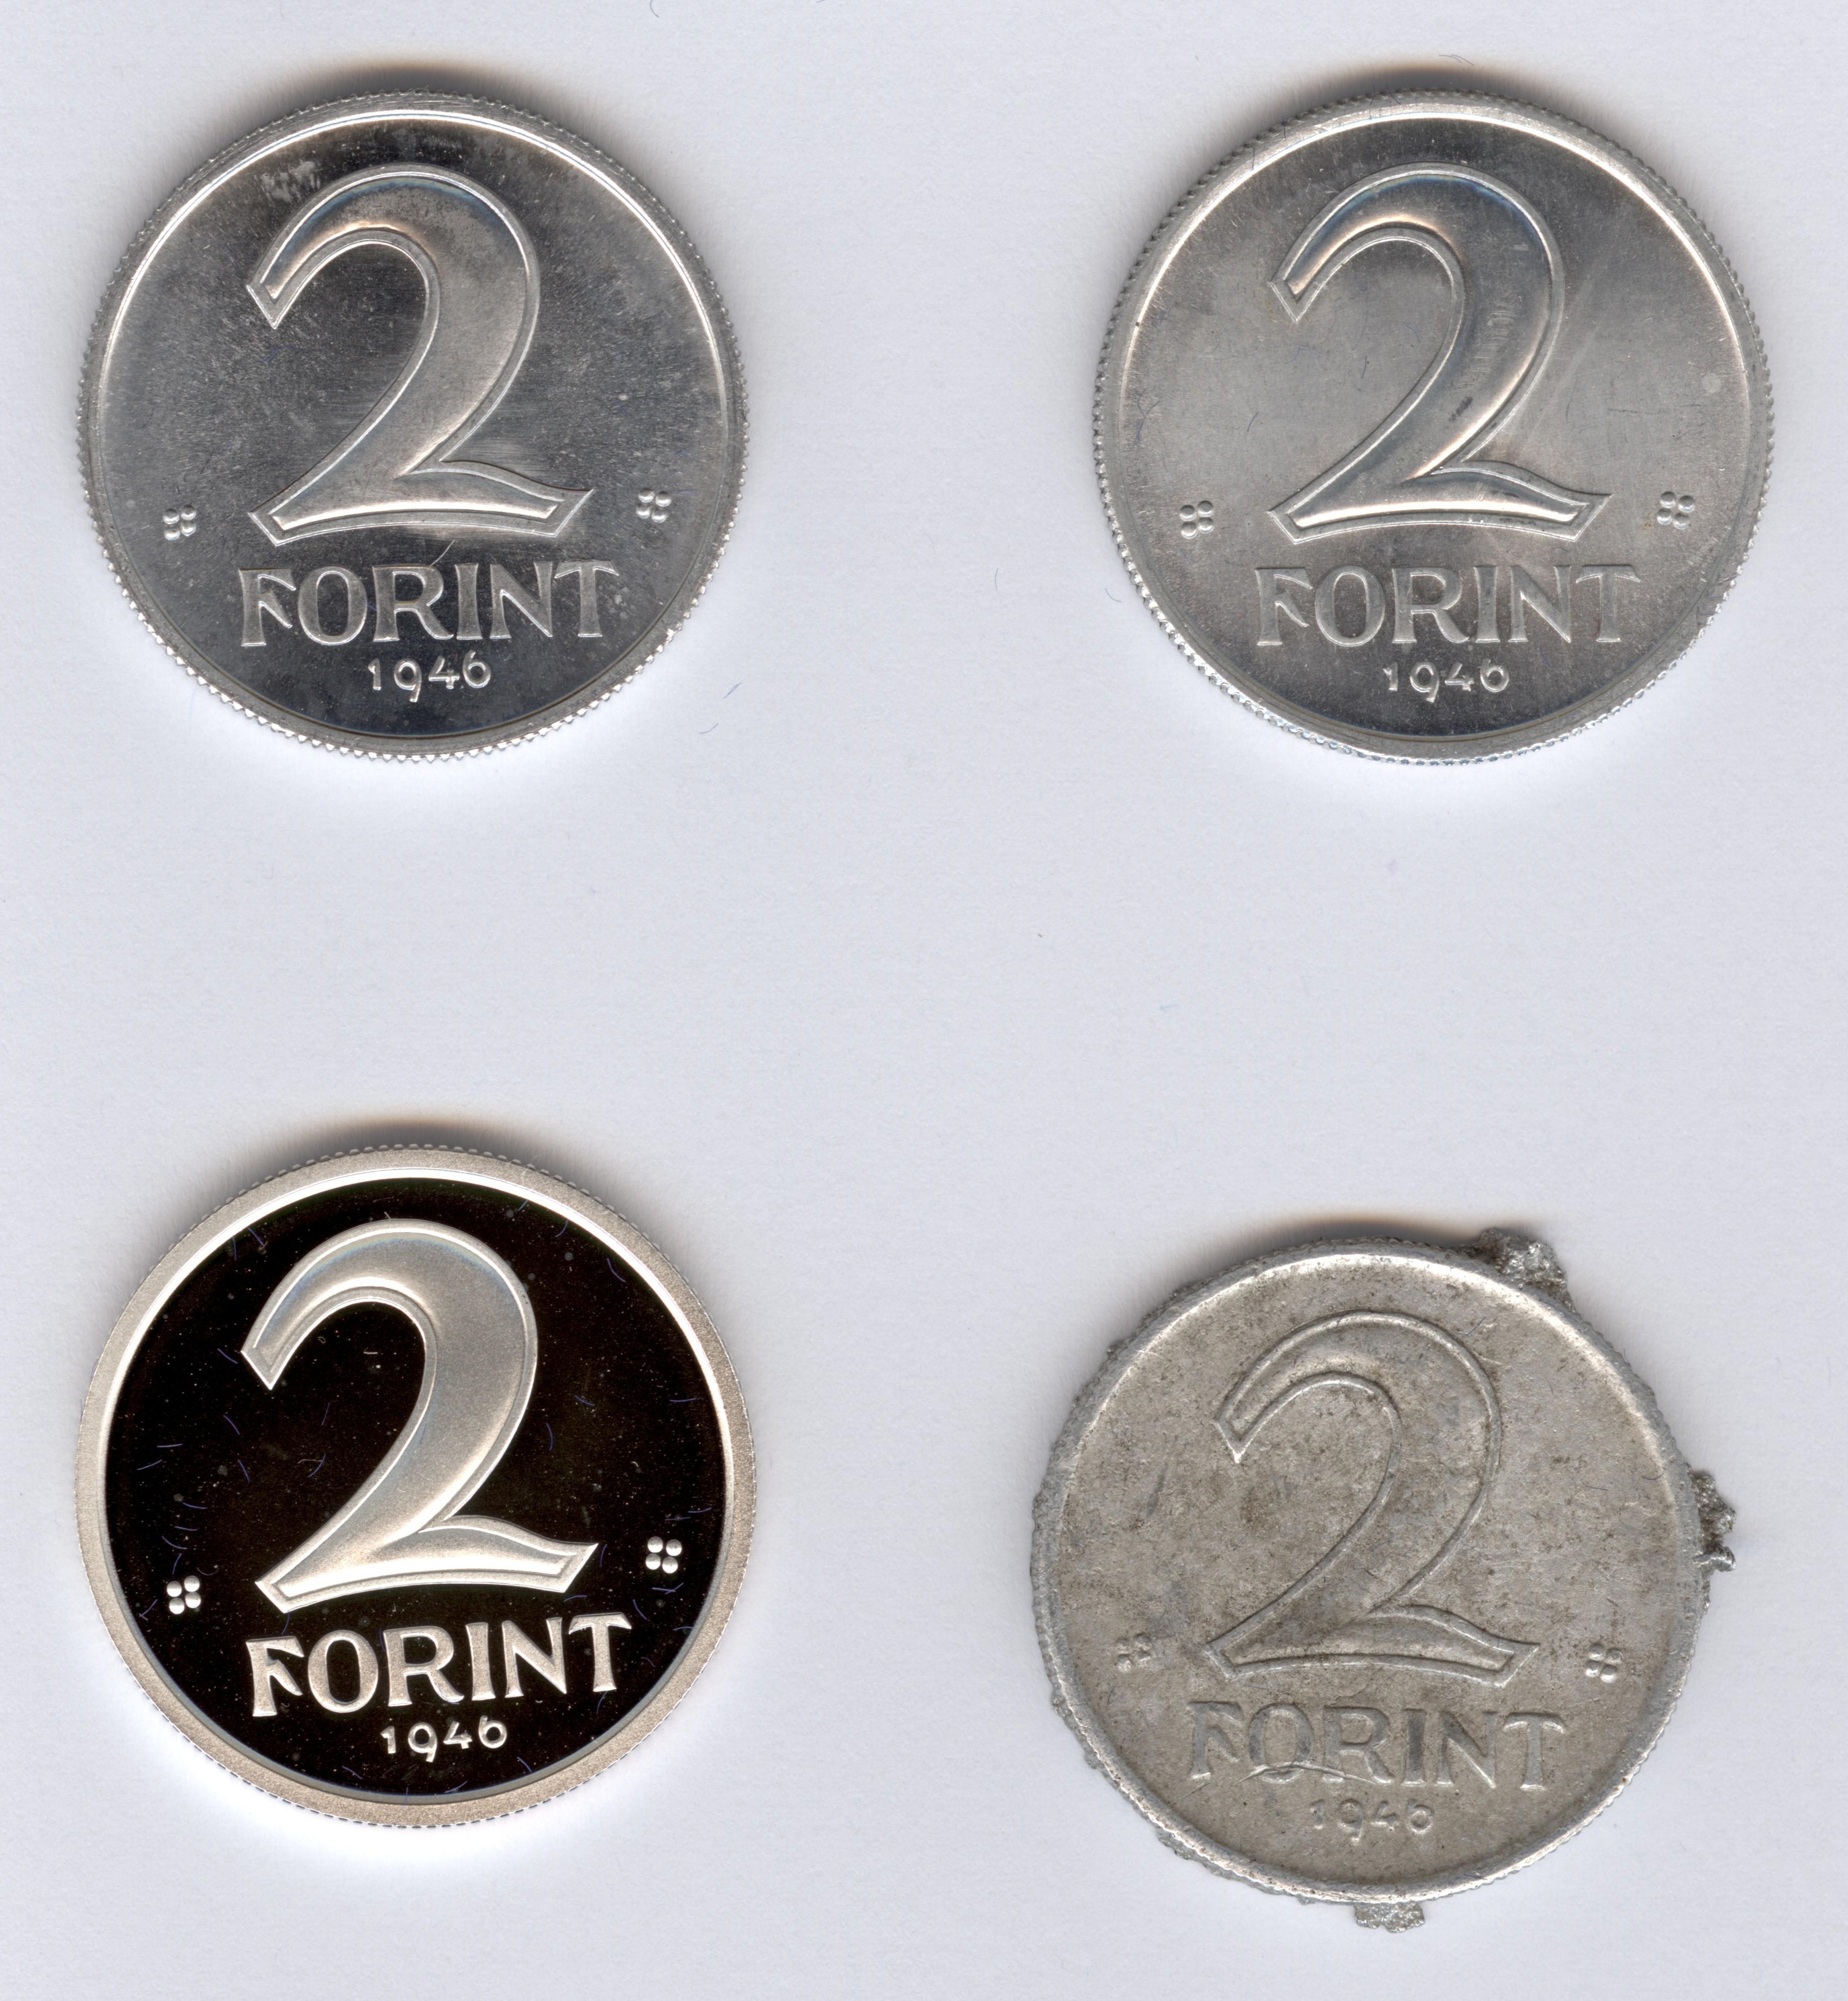 http://www.forintportal.hu/hirek/1946-os-2-forint-eredeti-es-az-artex-utanveret/1946-os-2-forint-eredeti-es-az-artex-utanveret_4erme-egyutt_nagy.jpg